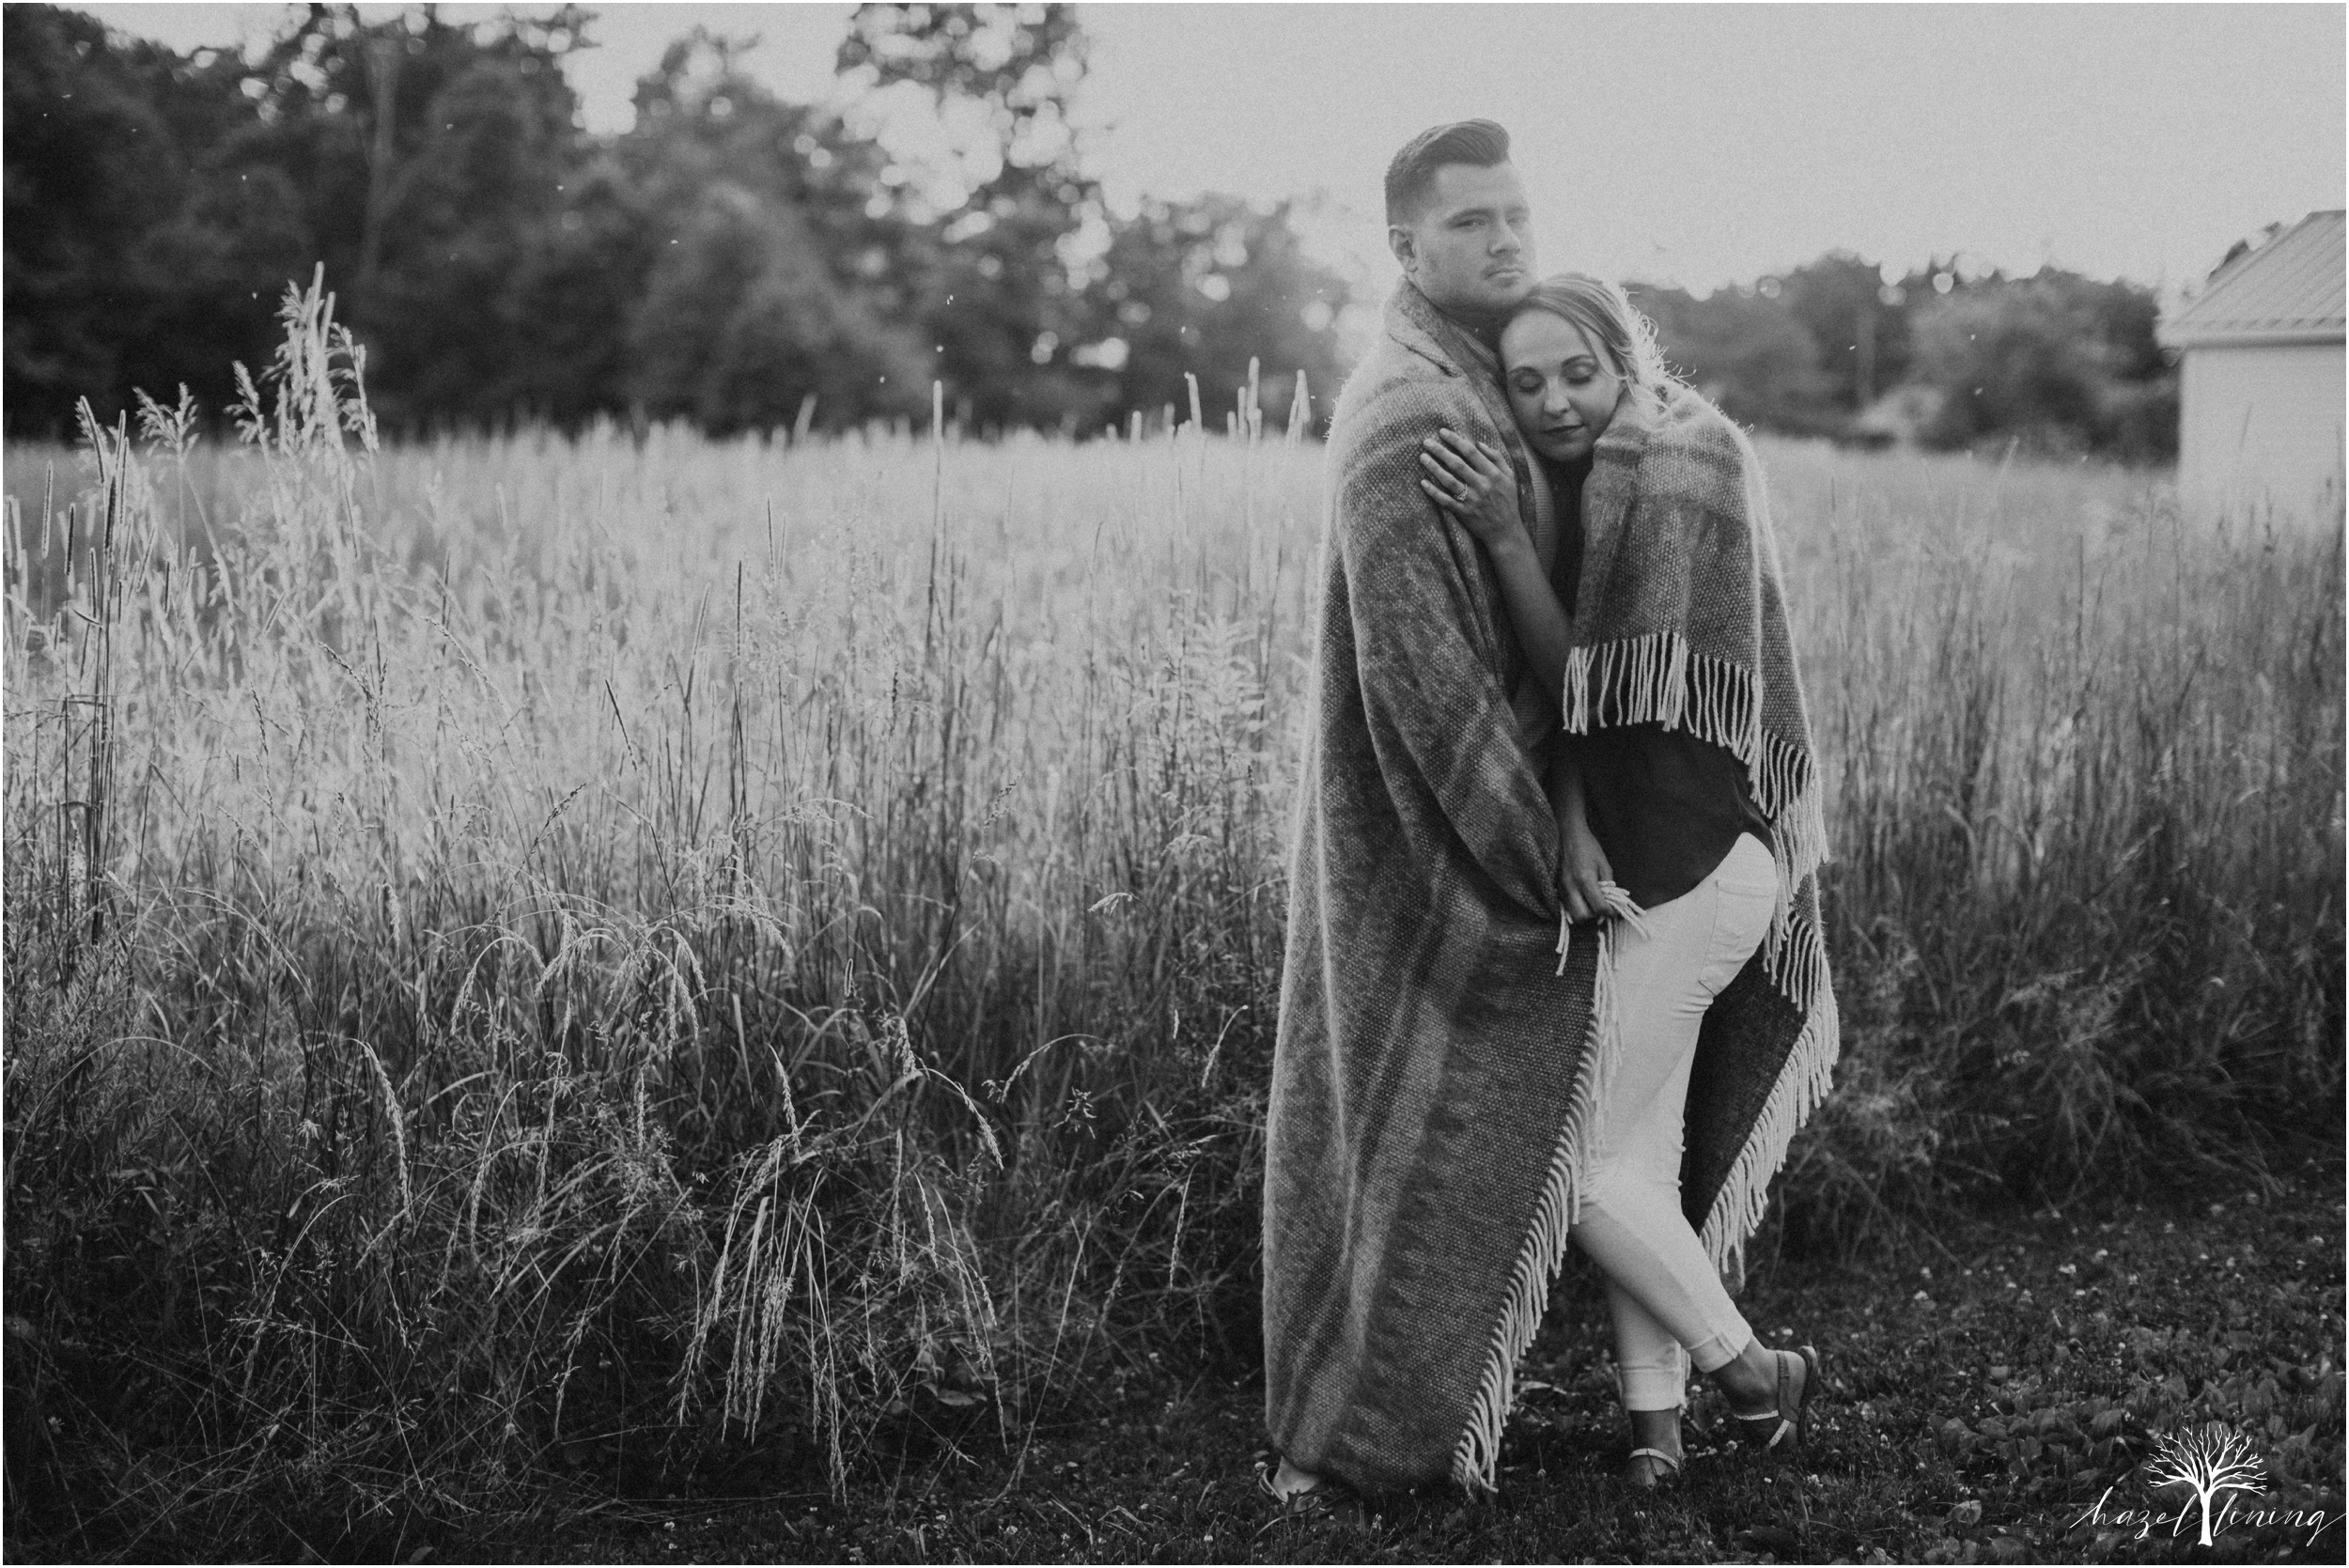 rachel-warner-chris-niedrist-the-farm-bakery-and-events-quakertown-pa-summer-engagement-hazel-lining-photography-destination-elopement-wedding-engagement-photography_0076.jpg